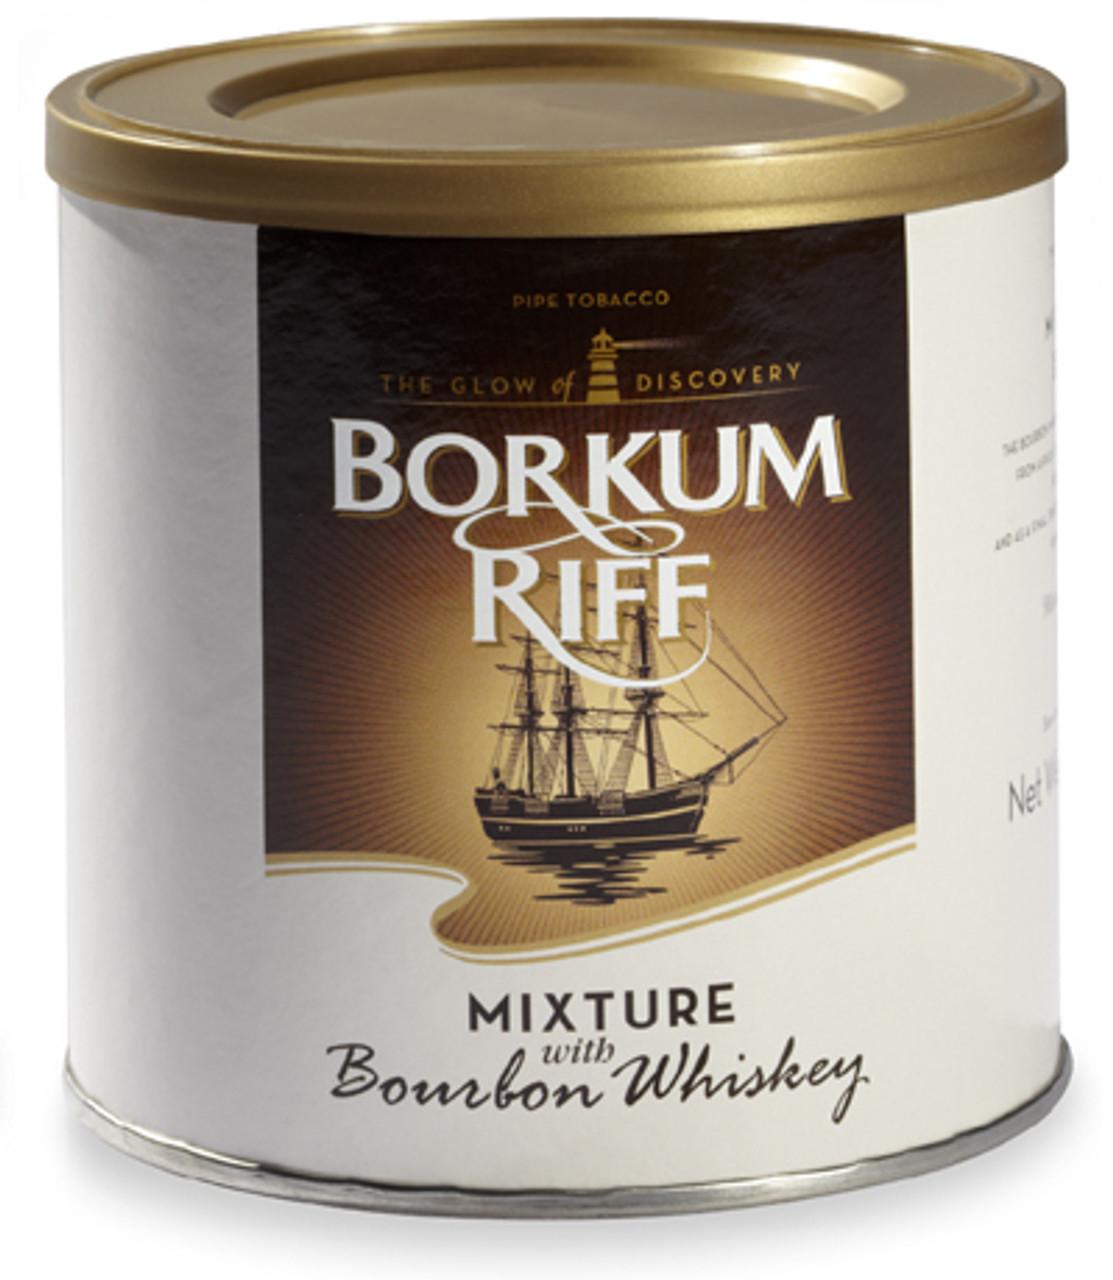 Borkum Riff Bourbon Whiskey Pipe Tobacco   7 OZ TIN